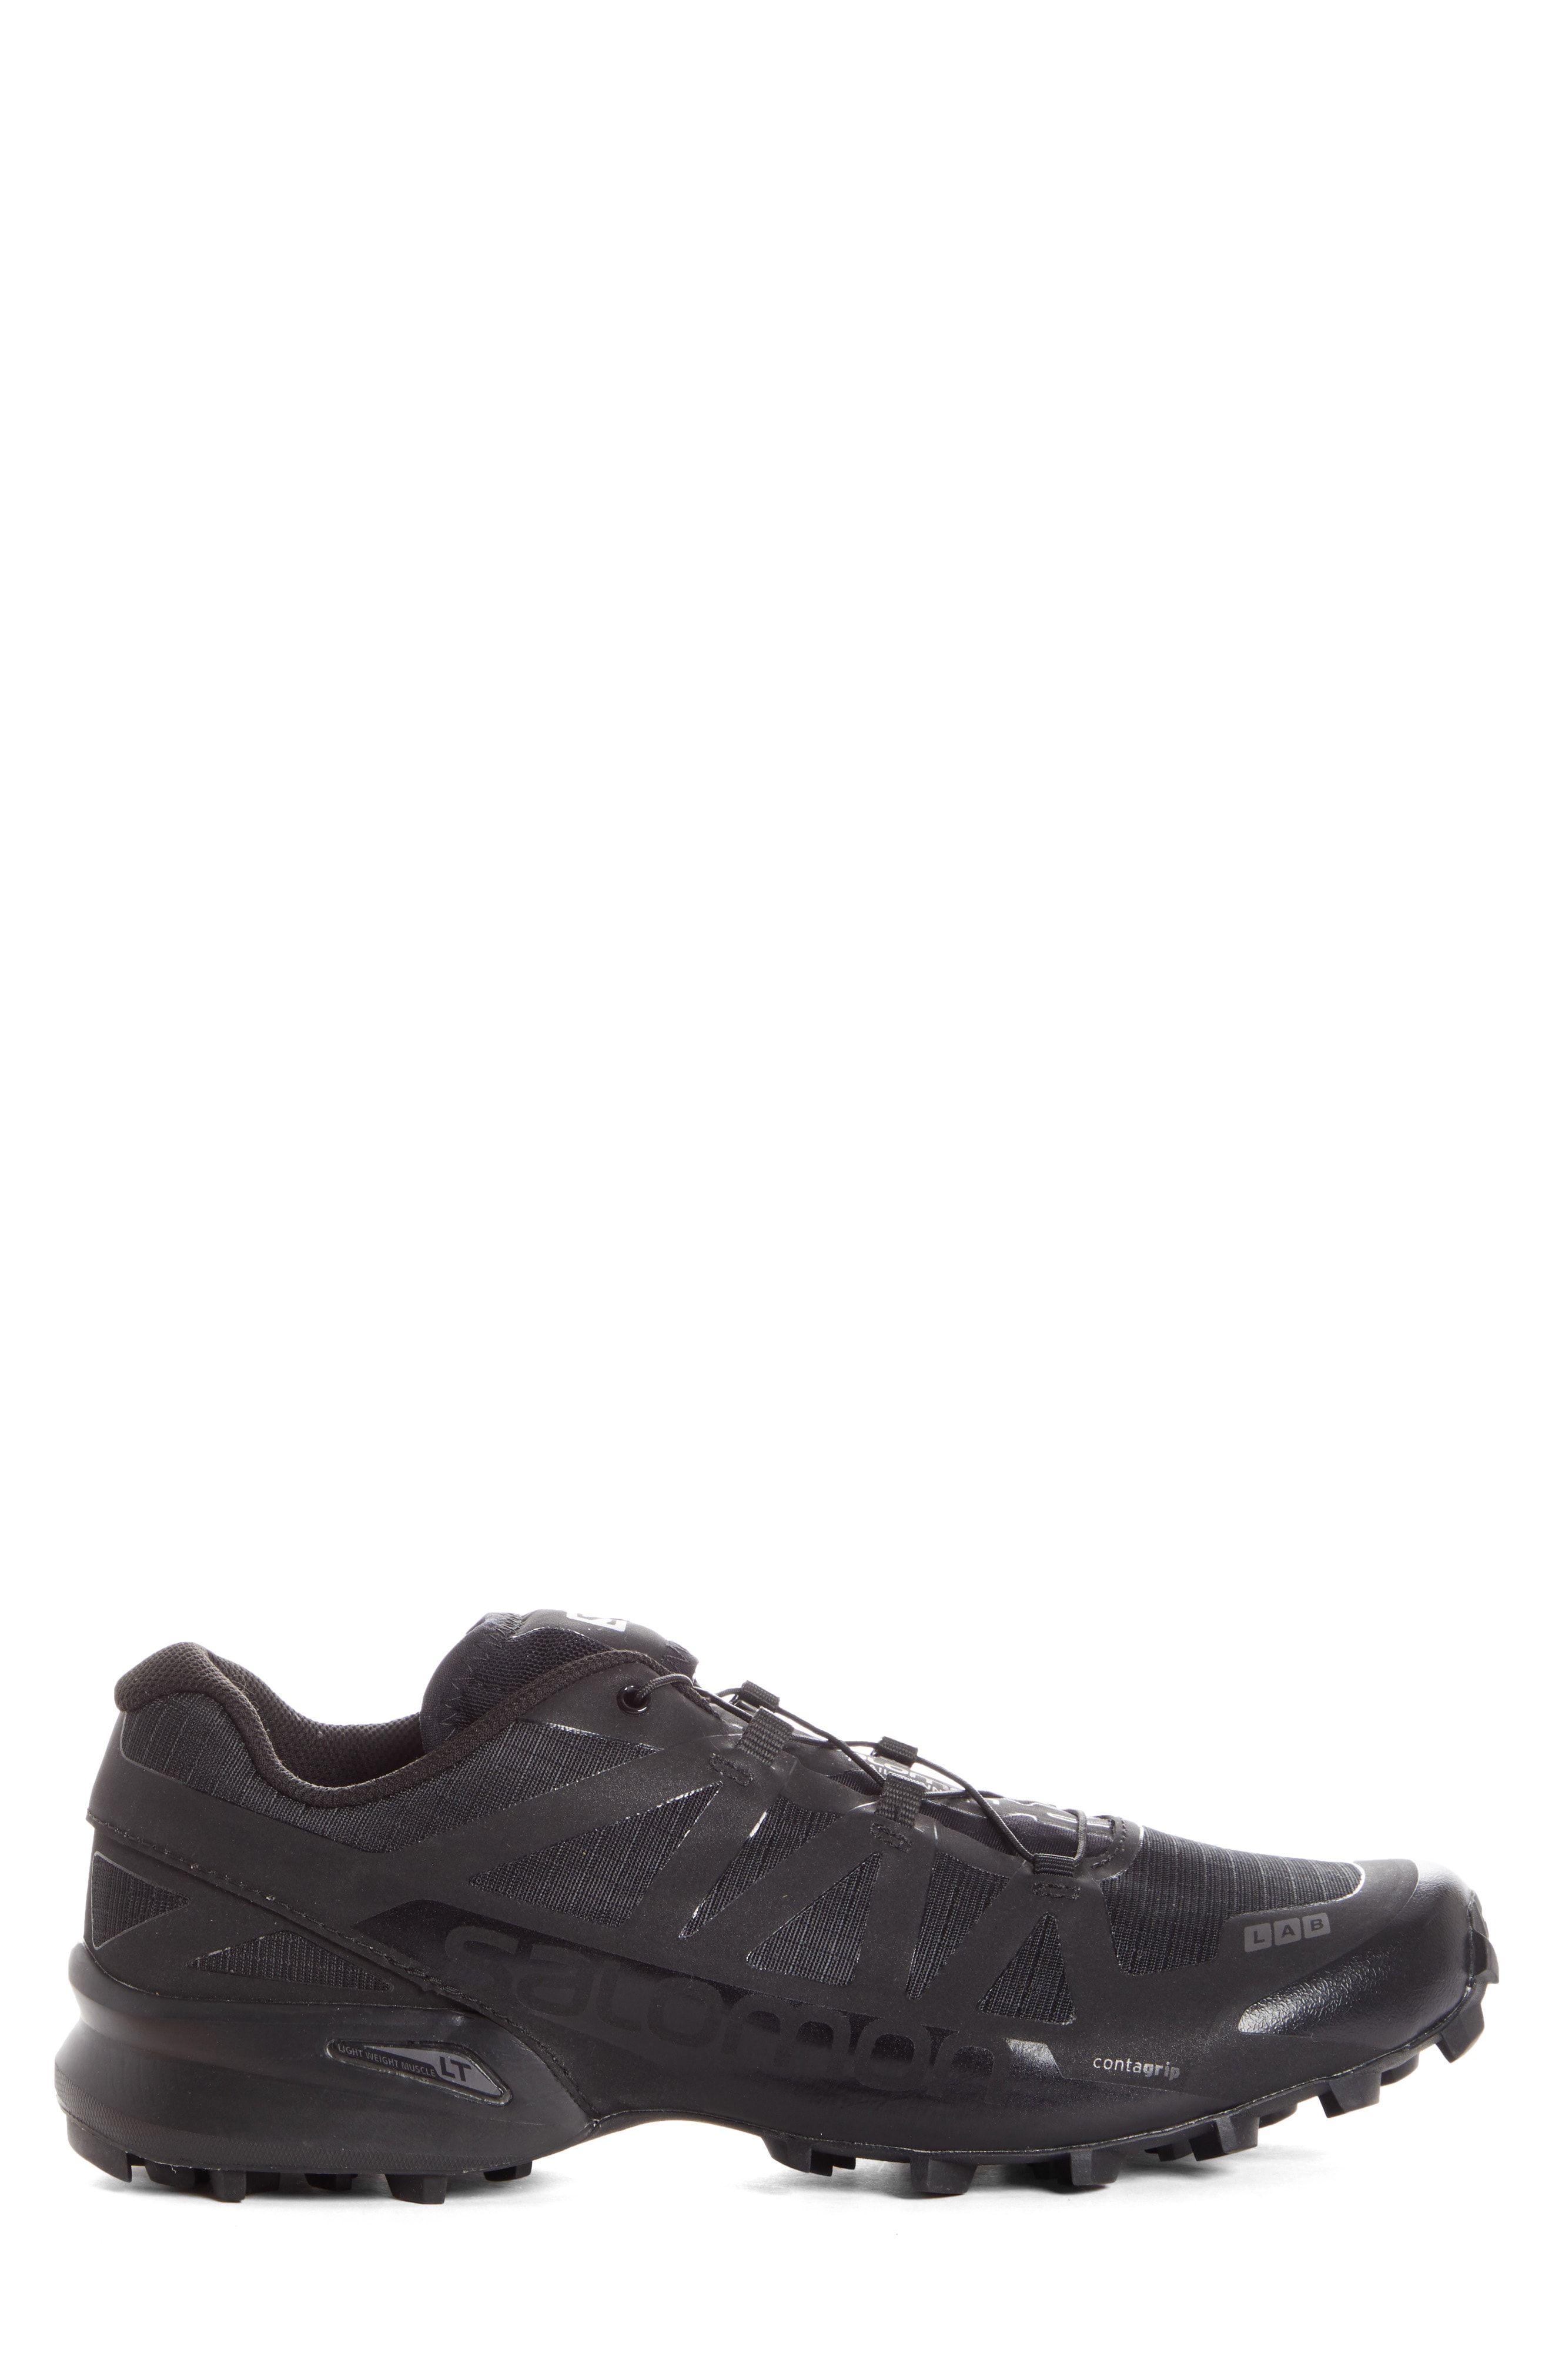 be7f02881685 SALOMON S LAB SPEEDCROSS TRAIL RUNNING SHOE.  salomon  shoes ...